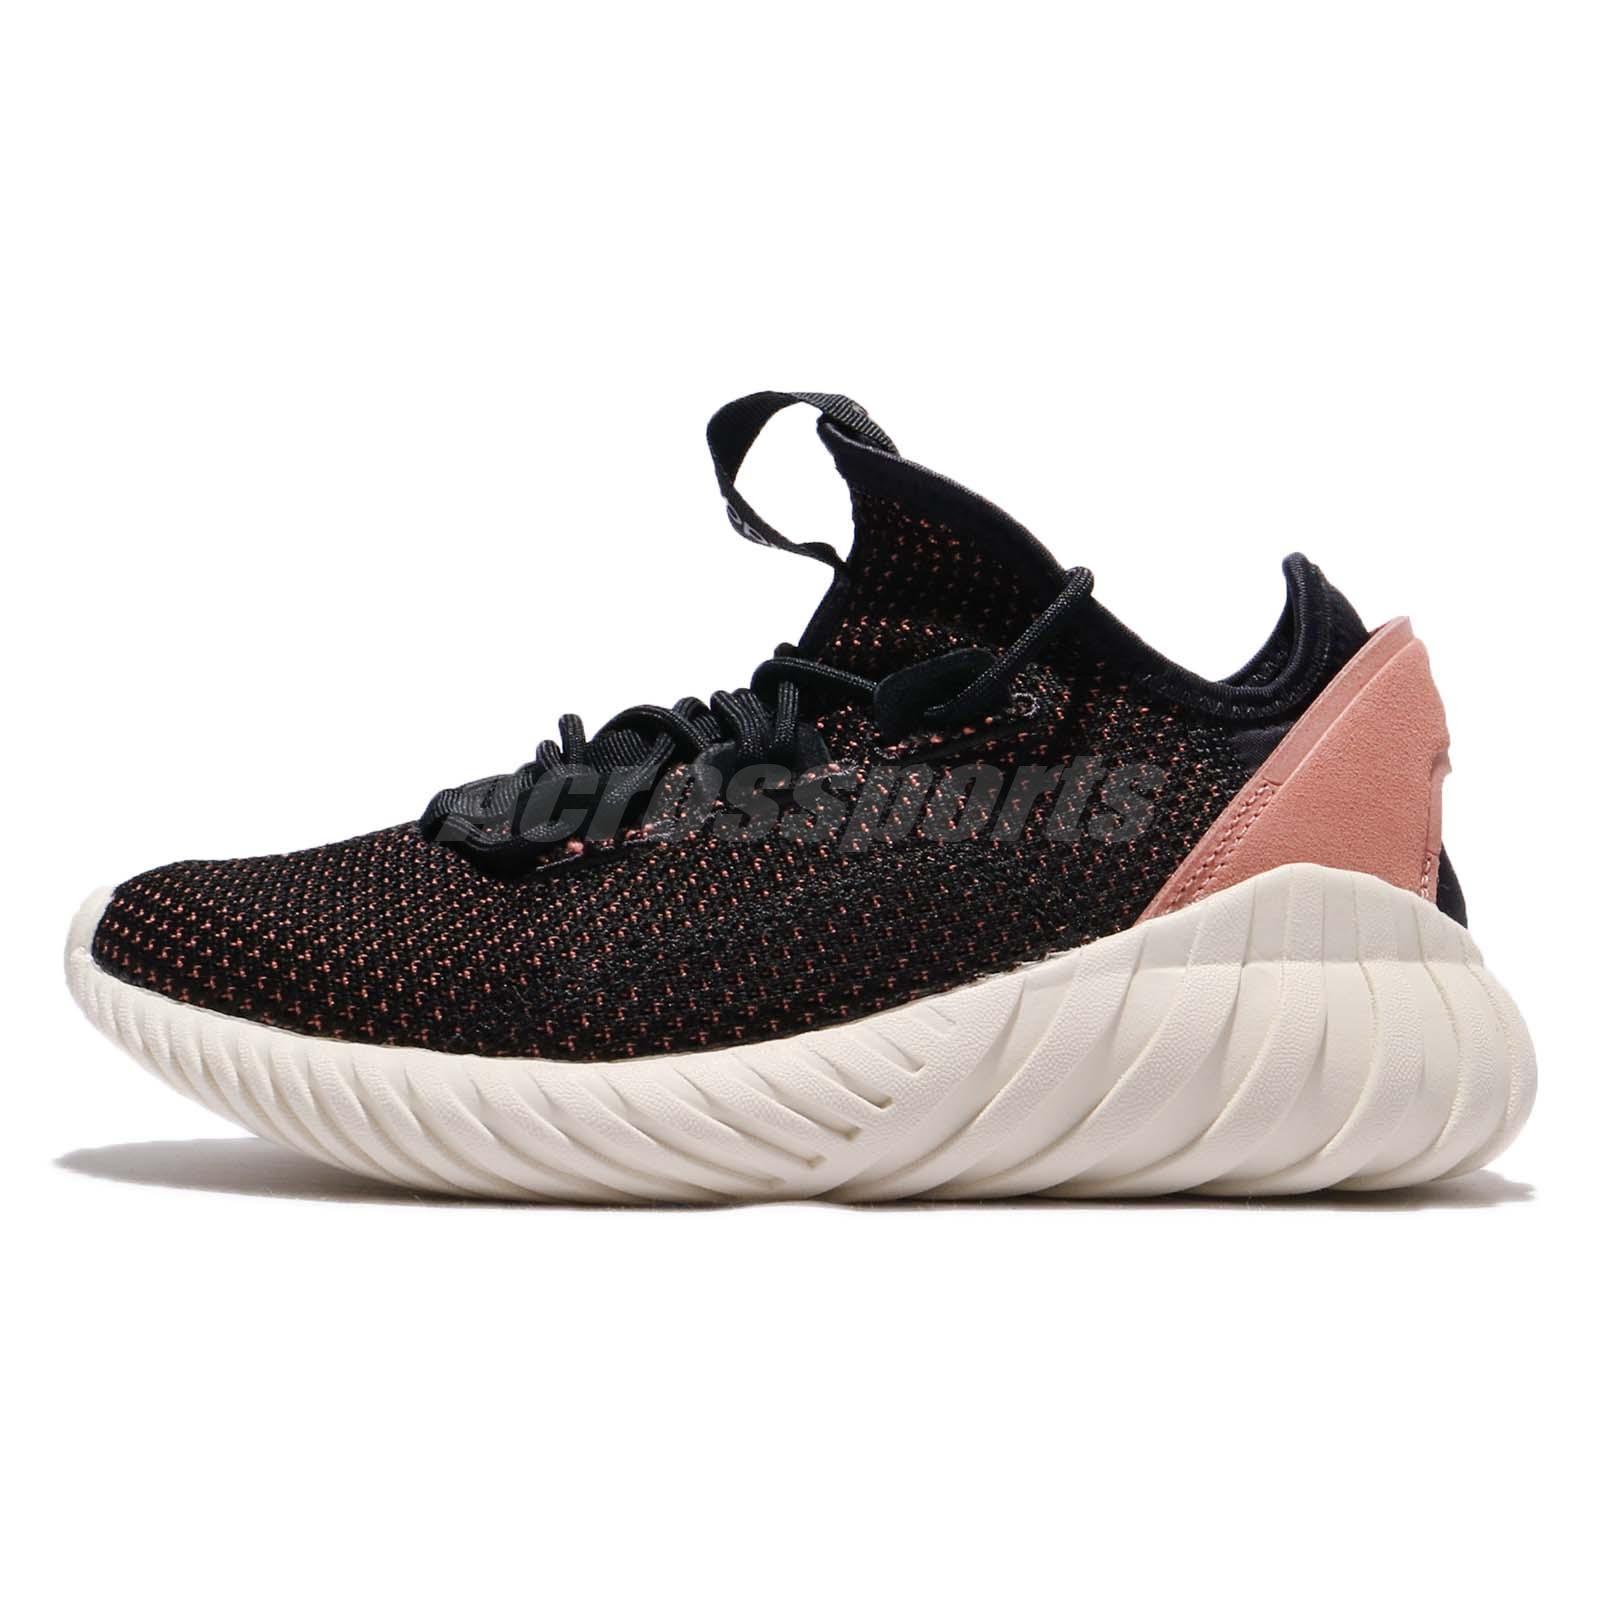 Adidas Tubular Doom Sock Pk W Womens BY9335 CBLACKCBLACKRAWPIN Womens Size 7.5